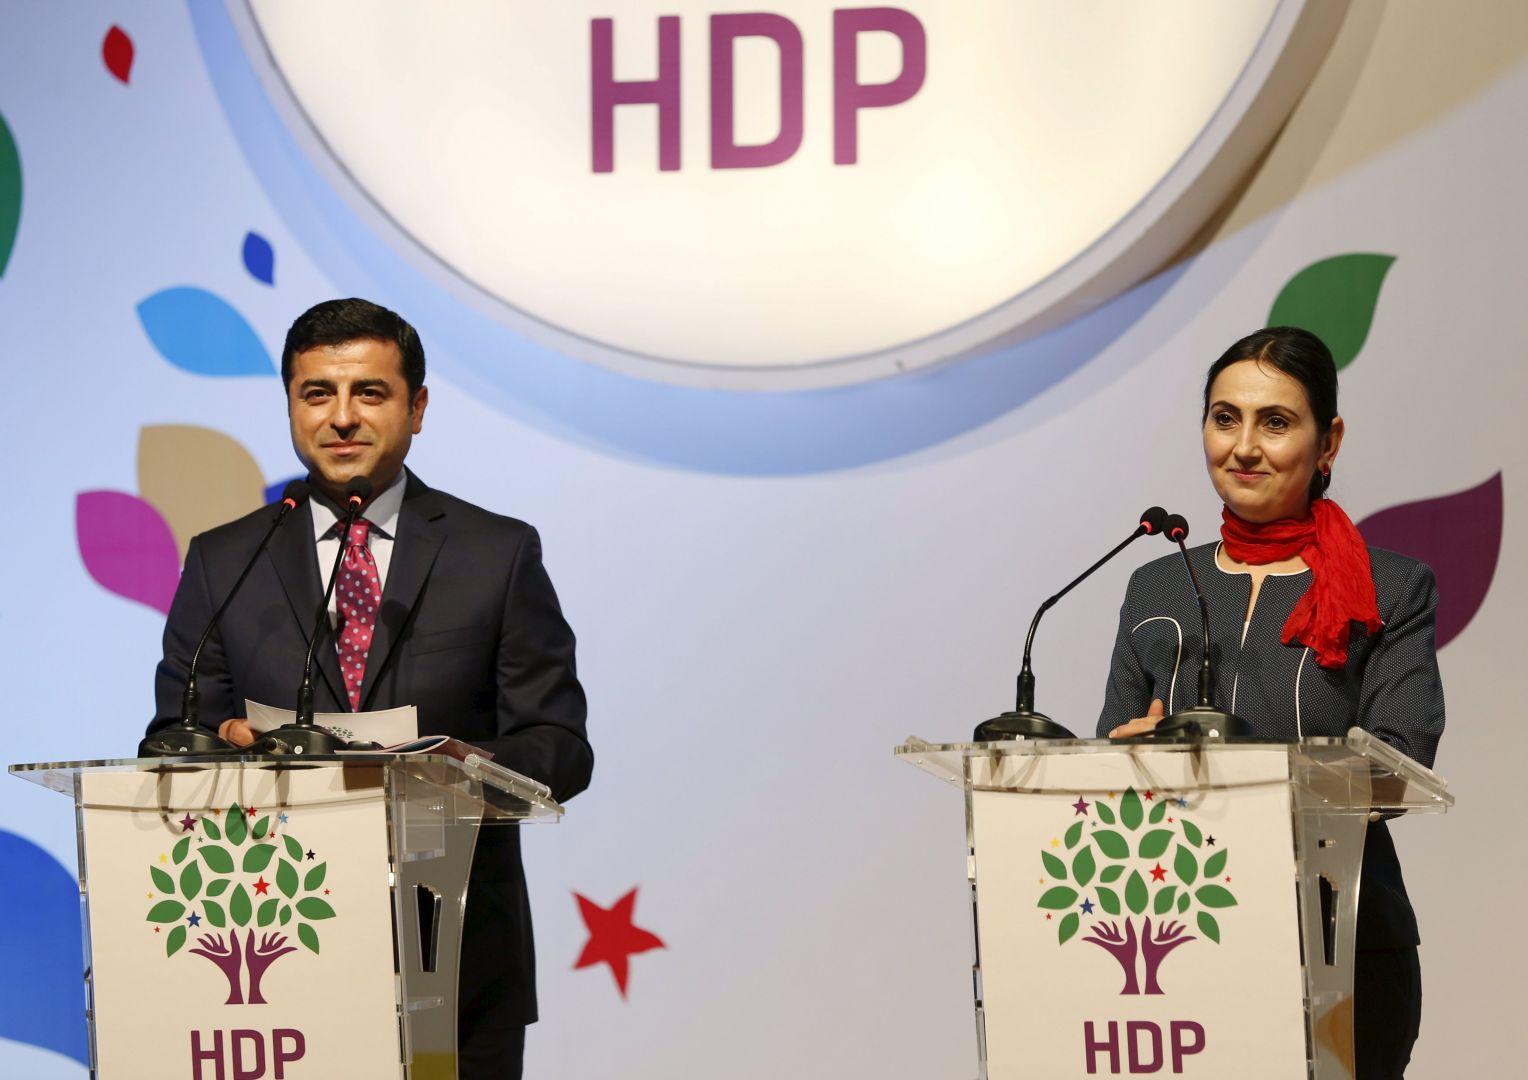 Co-leaders, Selahattin Demirtas and Figen Yuksekdag, of the People's Democratic Party (HDP)